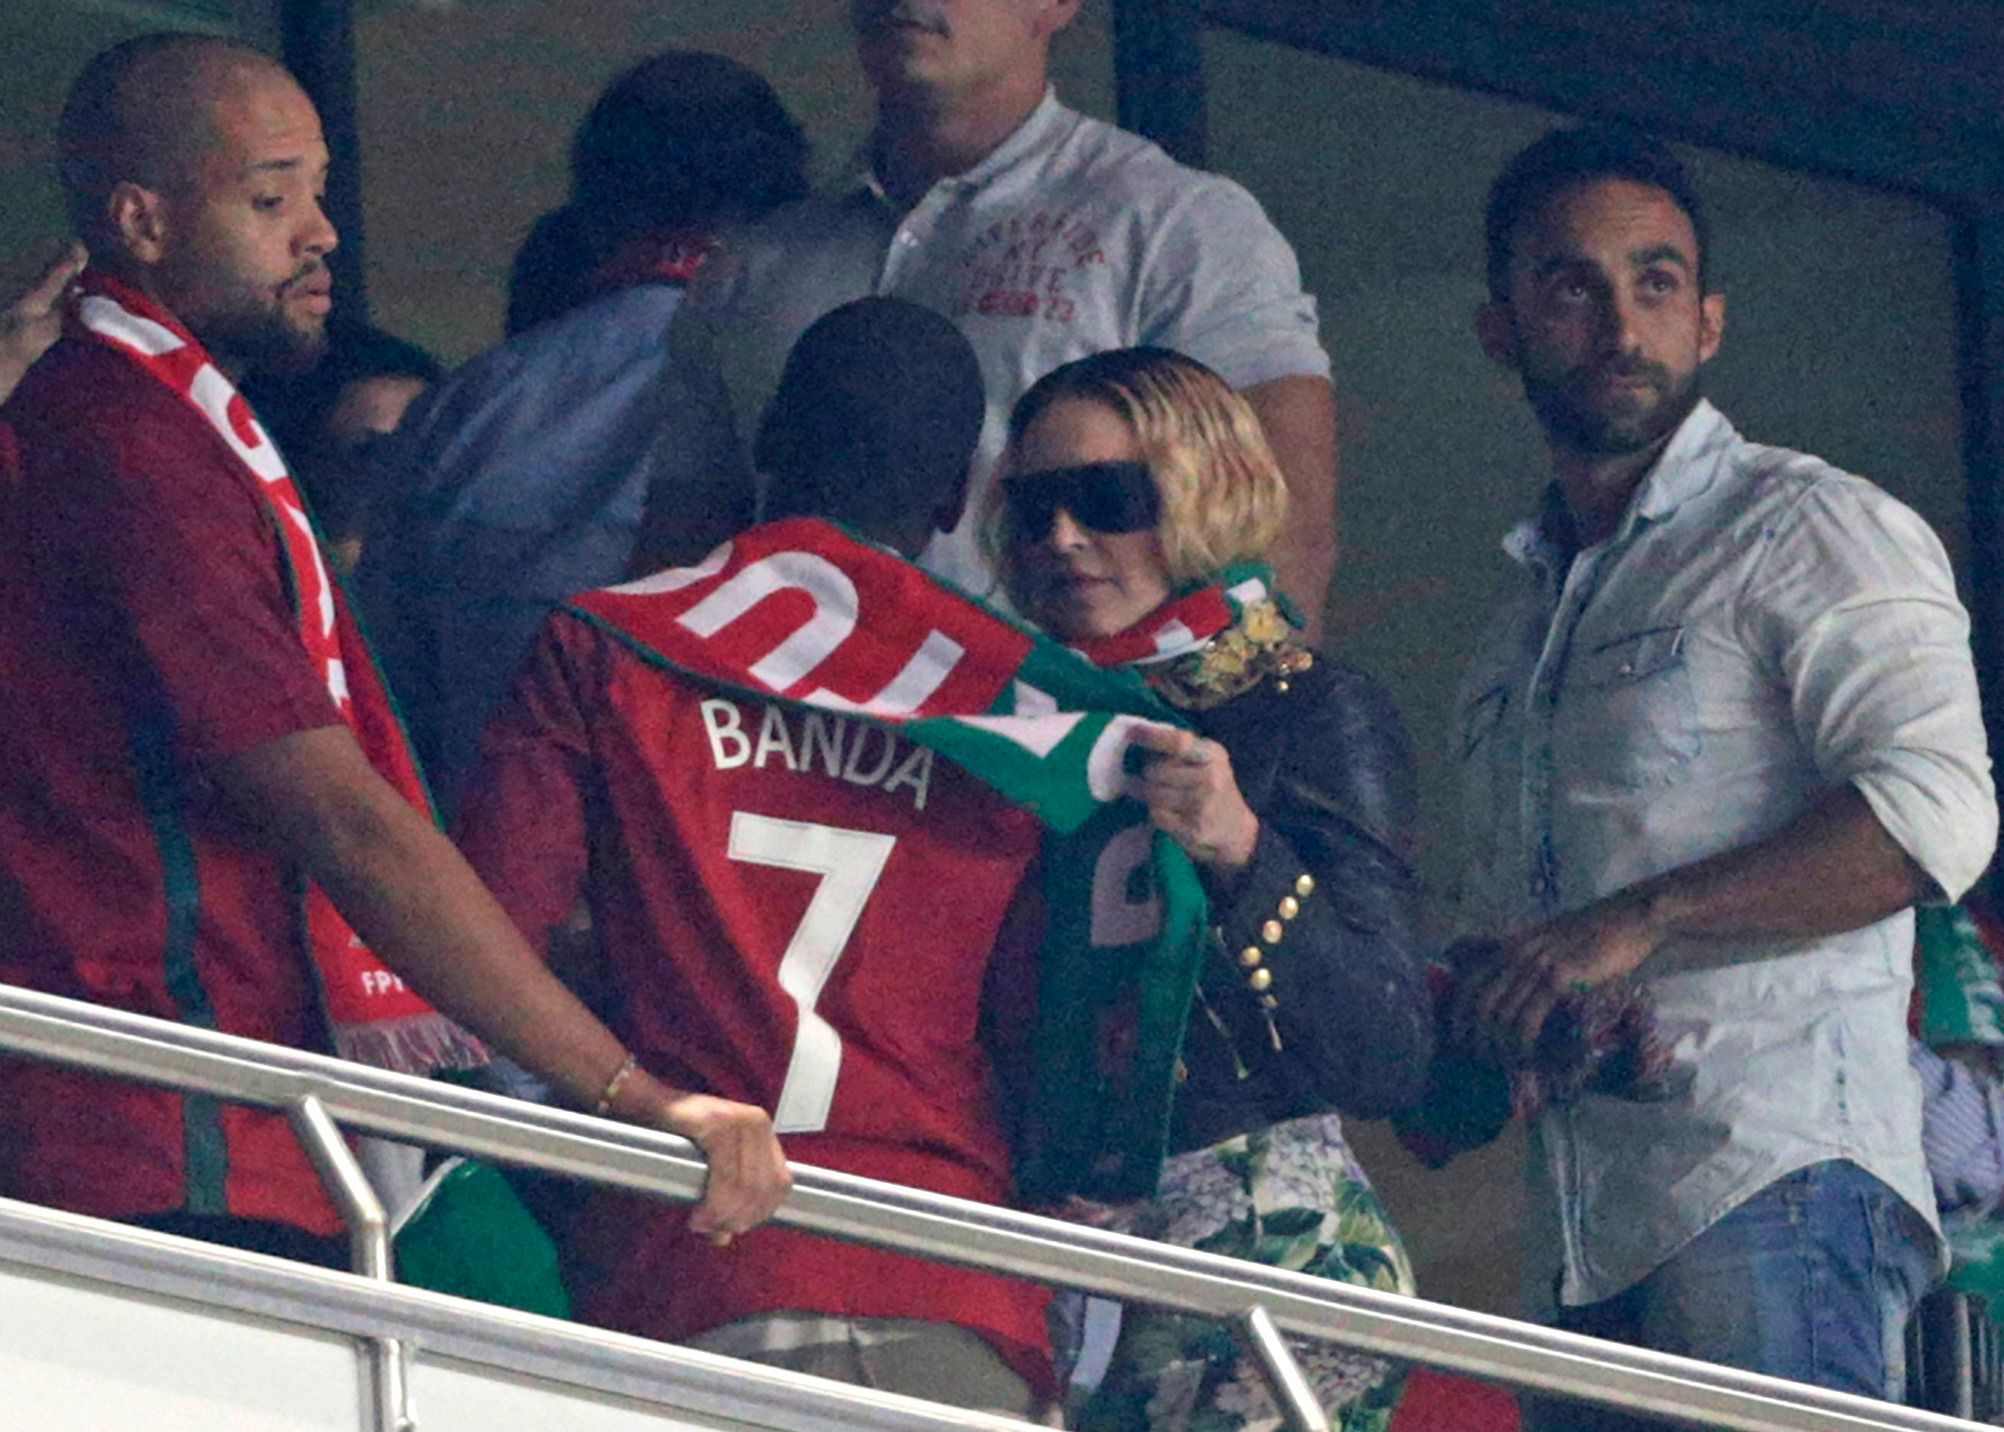 "In August 2018,&nbsp;Madonna&nbsp;reveals <a href=""https://www.huffingtonpost.com/entry/madonna-donald-trump-portugal_us_5b62"